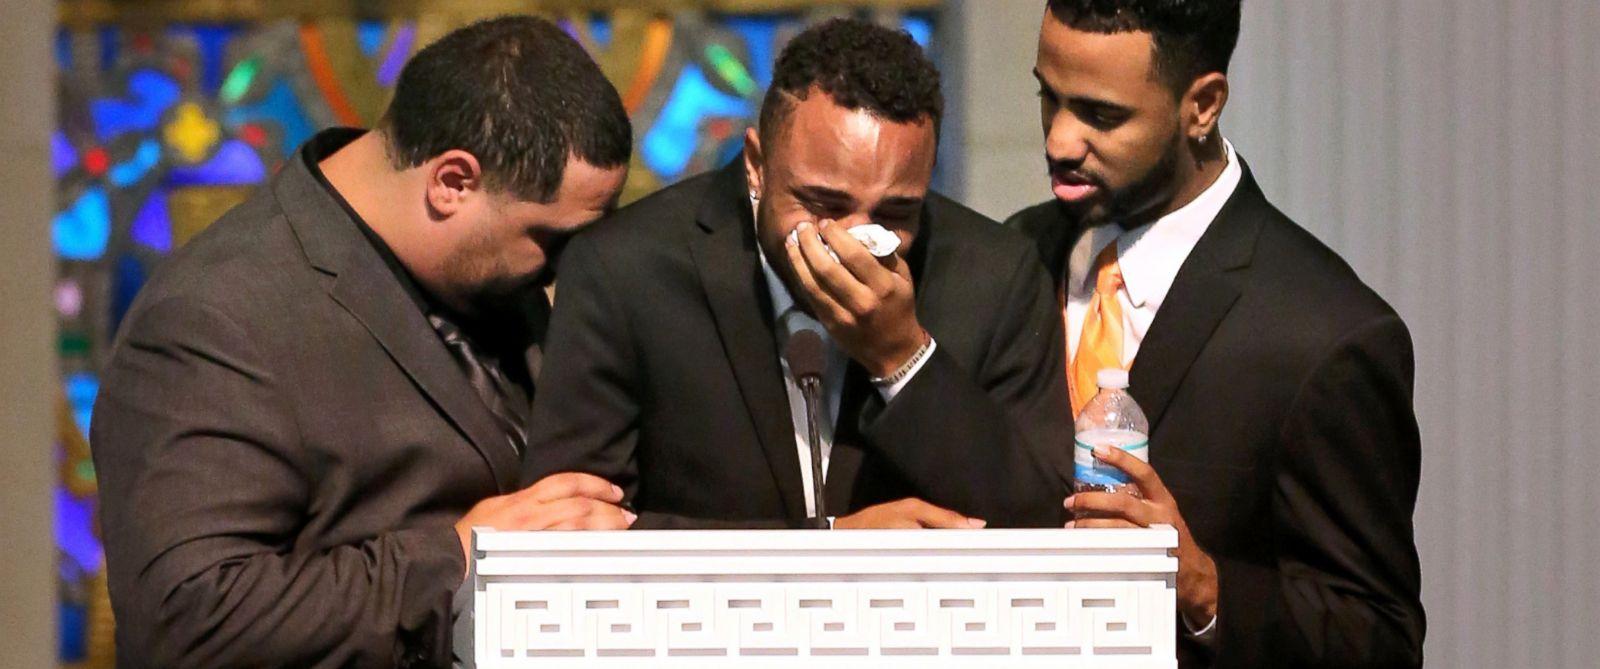 http://a.abcnews.com/images/US/AP_mccool_funeral_02_jef_160620_31x13_1600.jpg